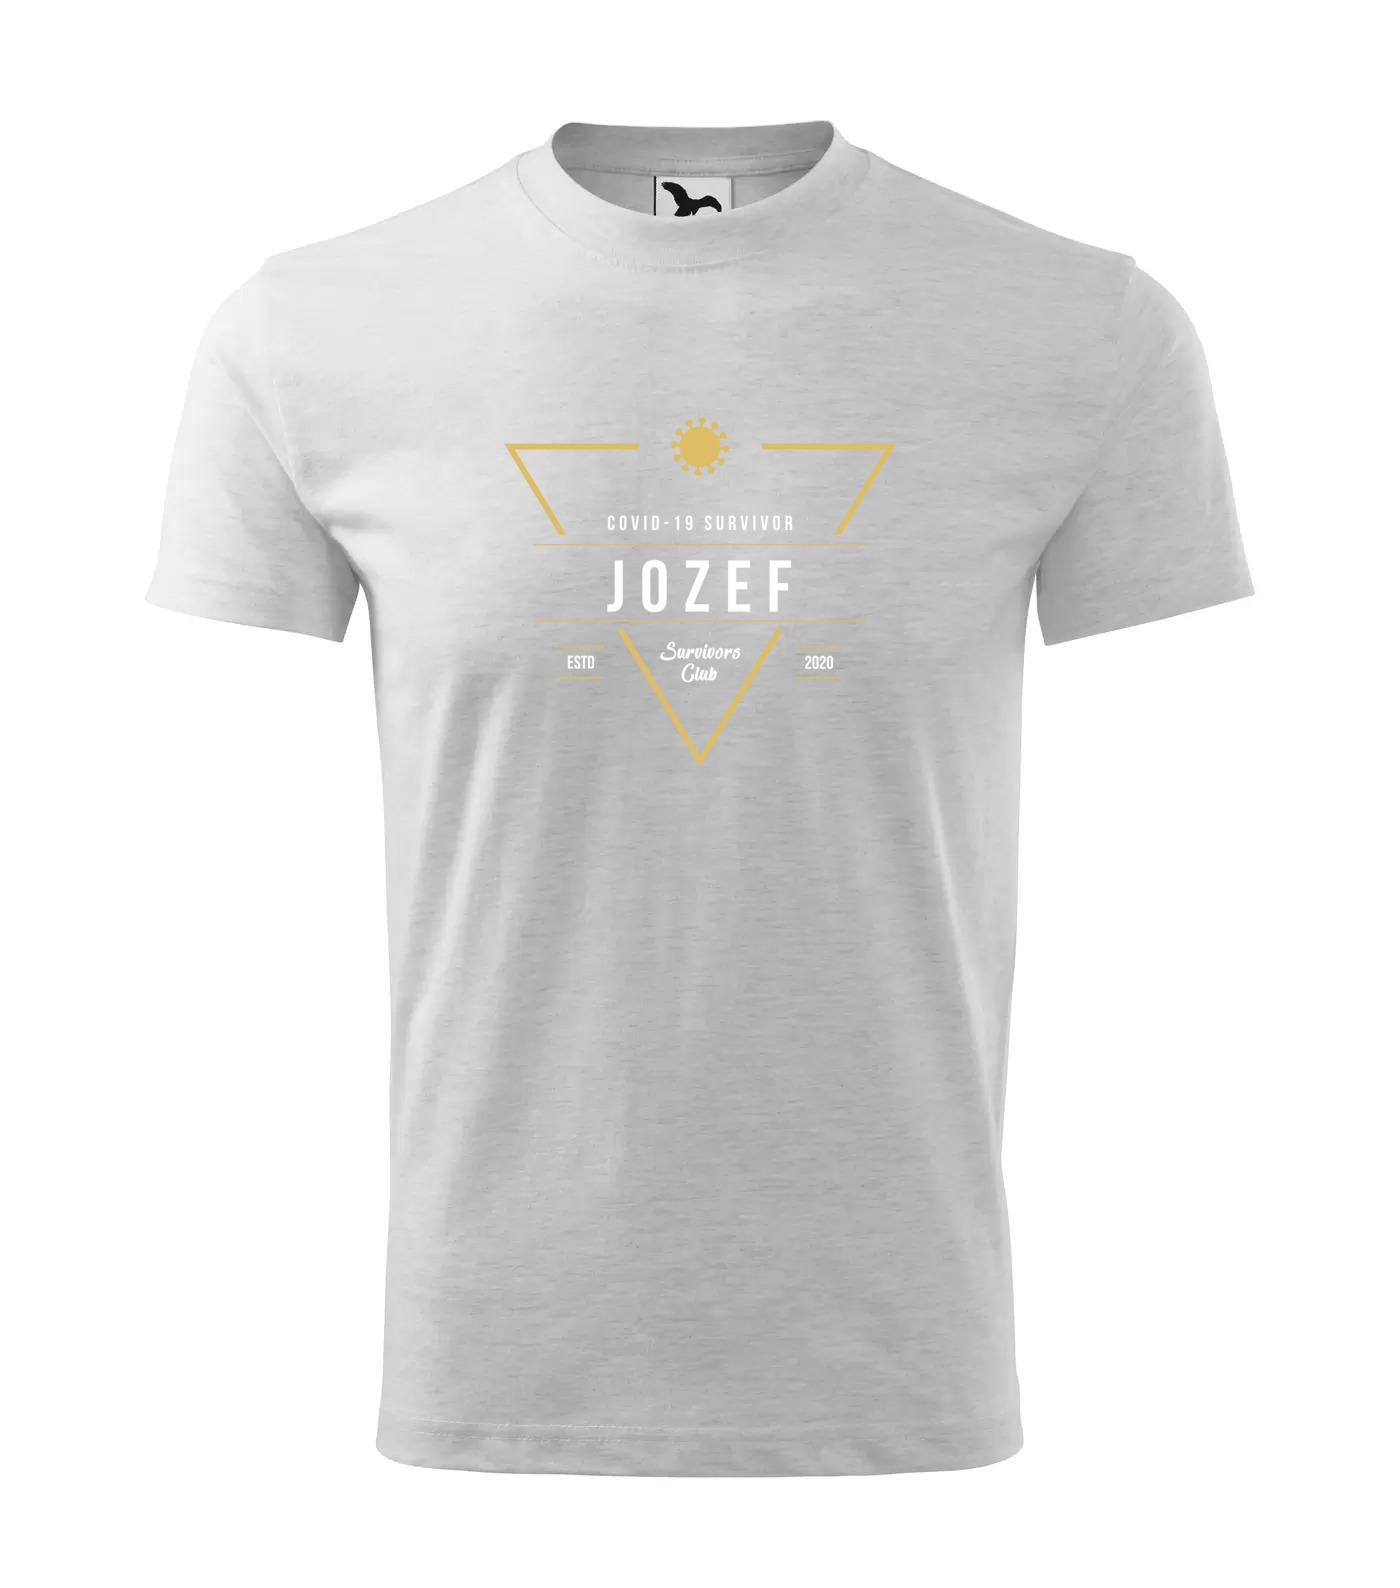 Tričko Survivor Club Jozef